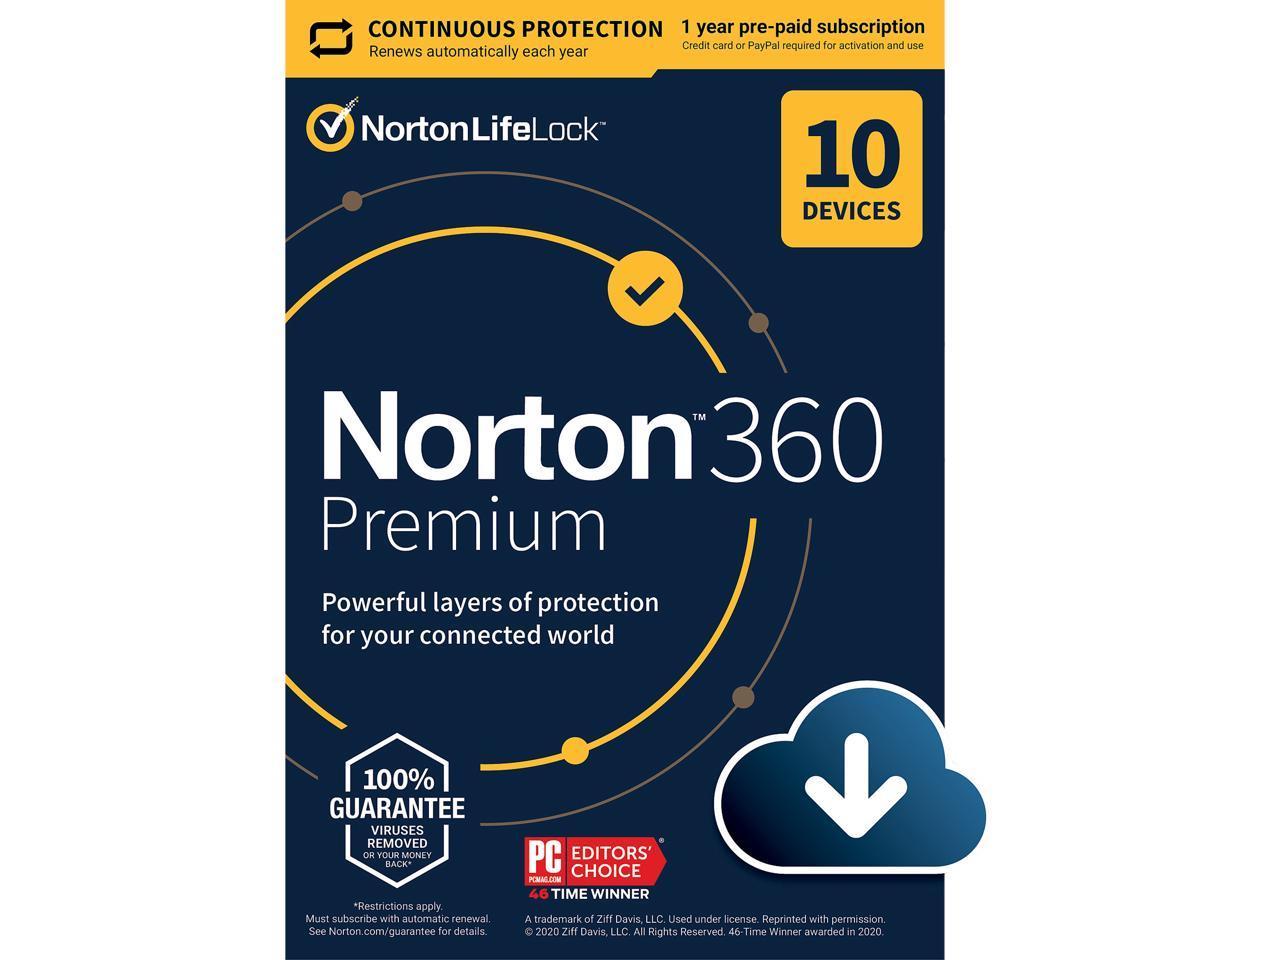 Norton 360 Premium 2021 Antivirus Software: 1-Year / 10 Devices (Digital Download) $25 at Newegg